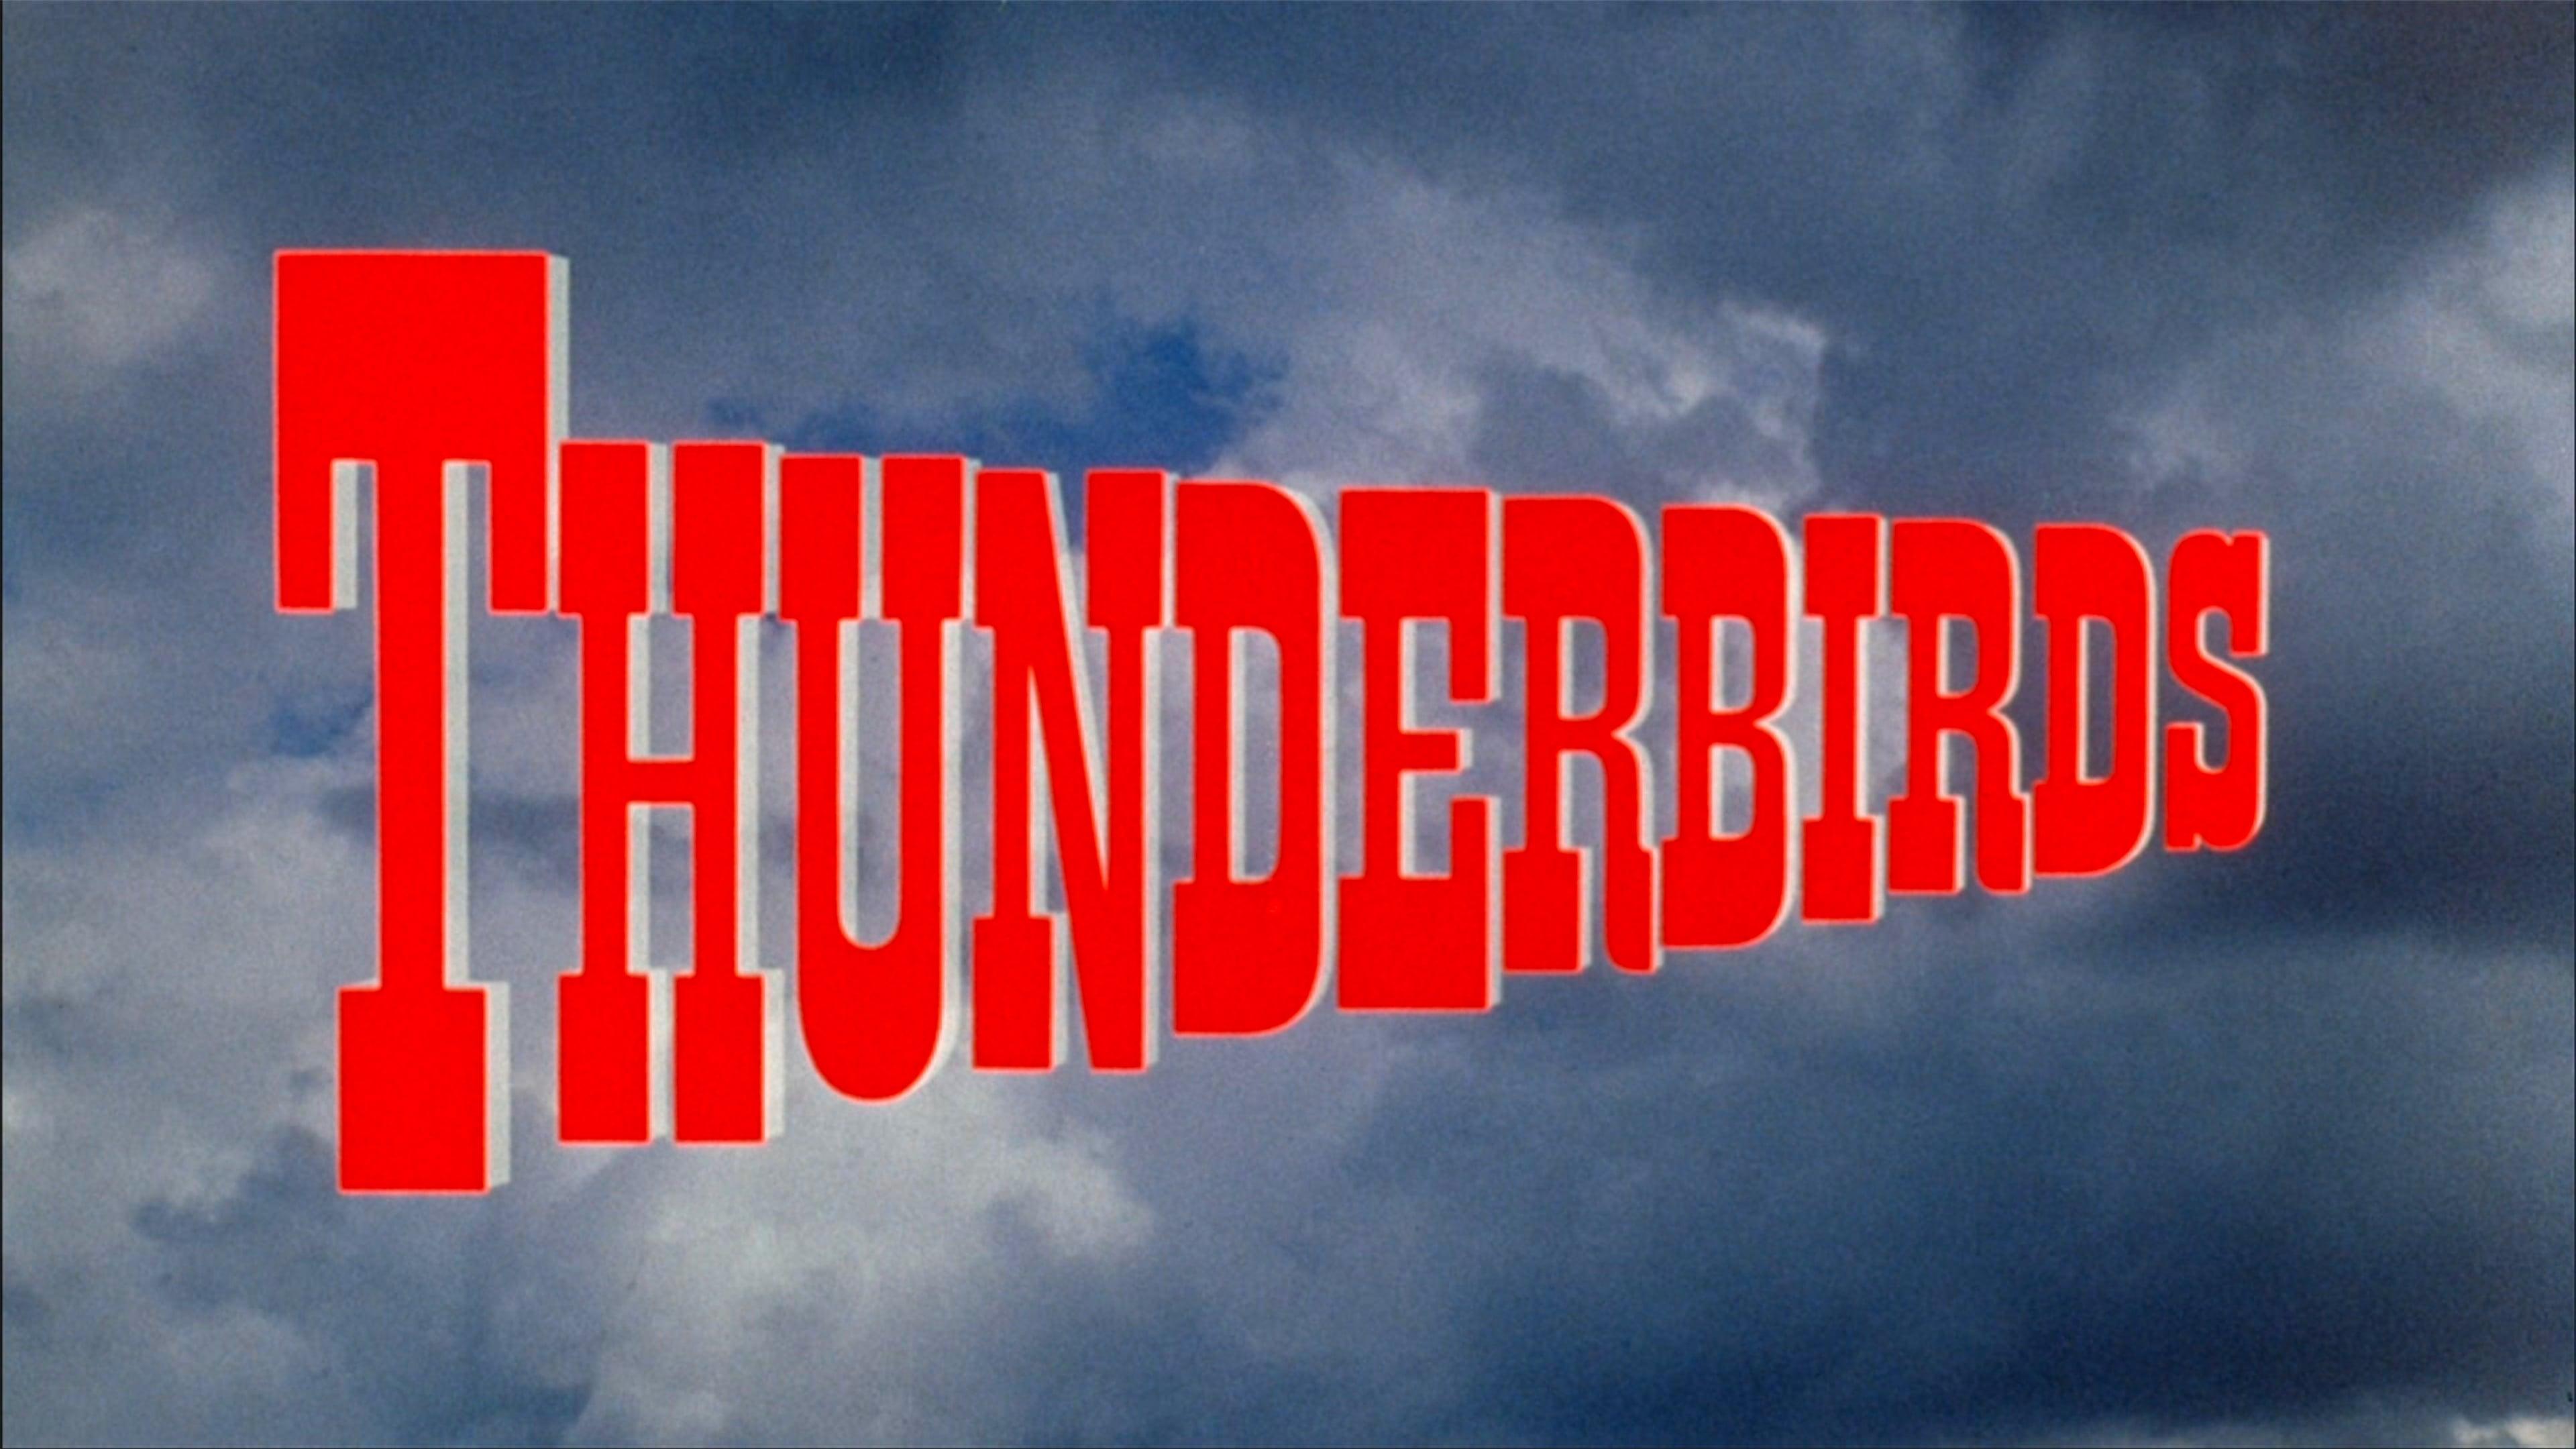 Thunderbirds - Season 1